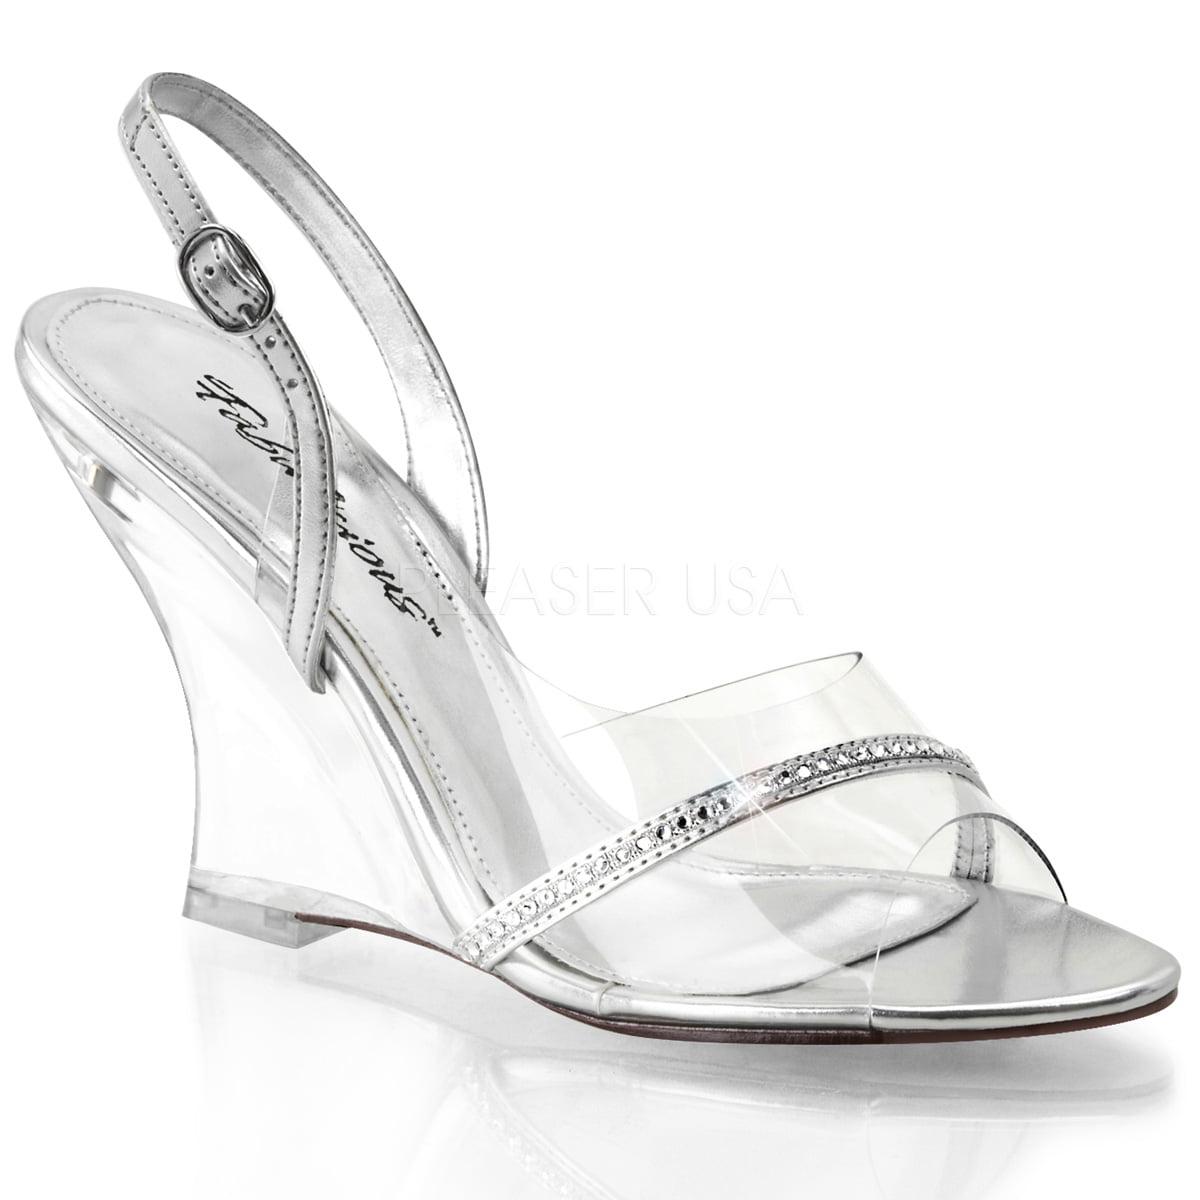 Women's Fabulicious Lovely 456 Economical, stylish, and eye-catching shoes